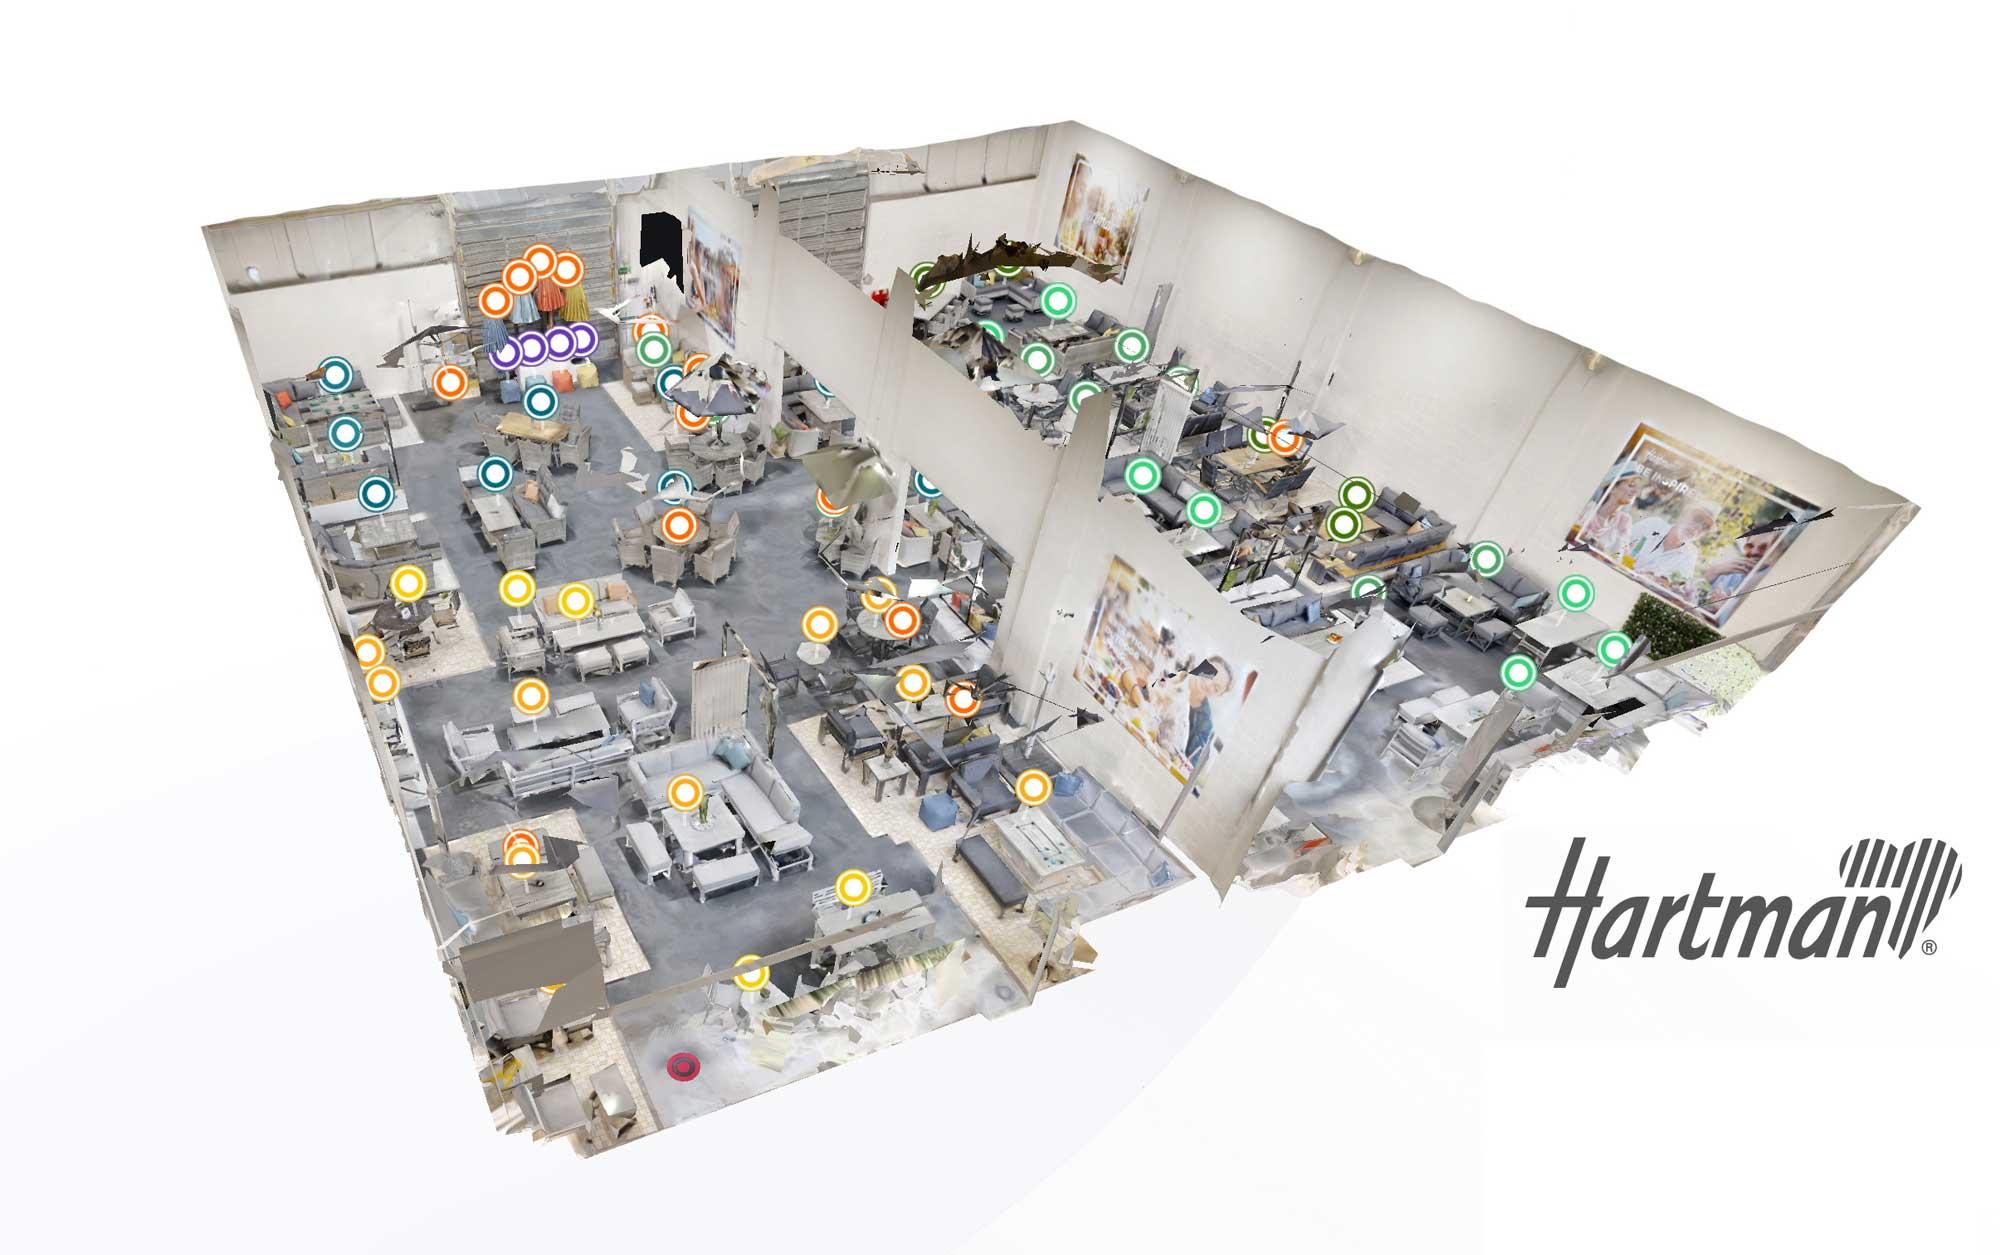 hartman-launches-virtual-3d-showroom-experience